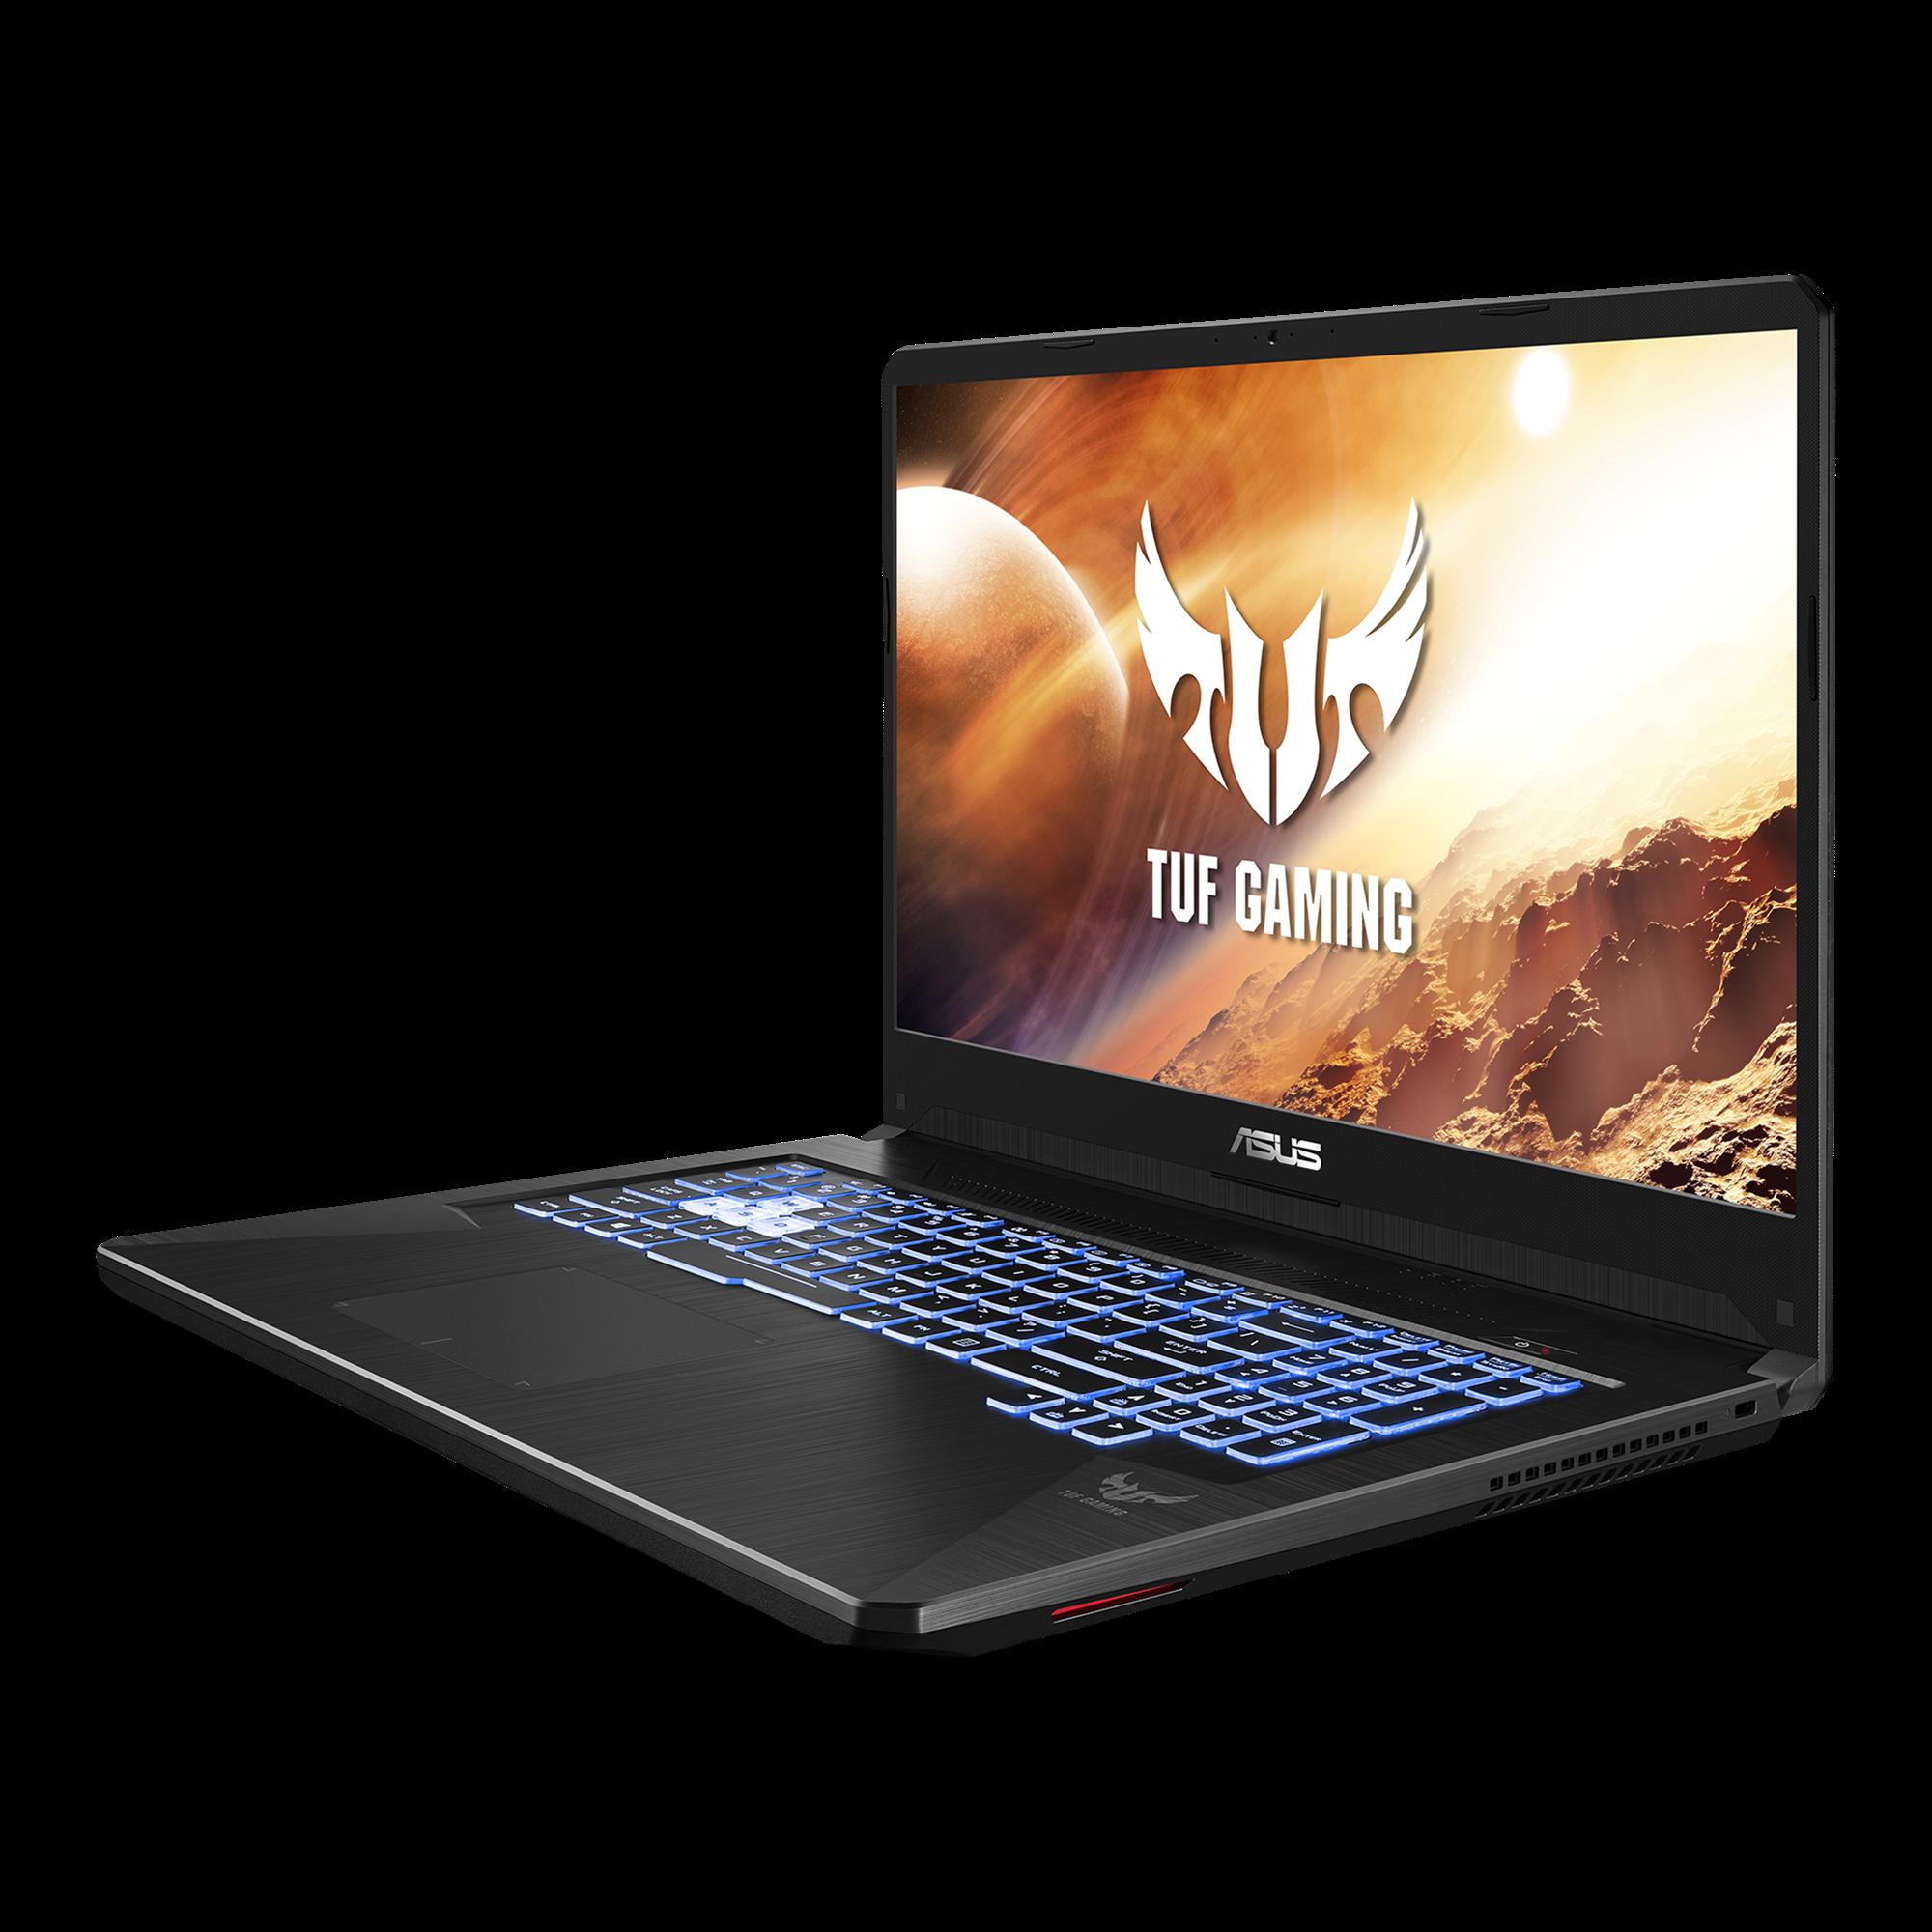 Asus Tuf Gaming Fx705dd Dt Du Laptops For Gaming Asus Usa